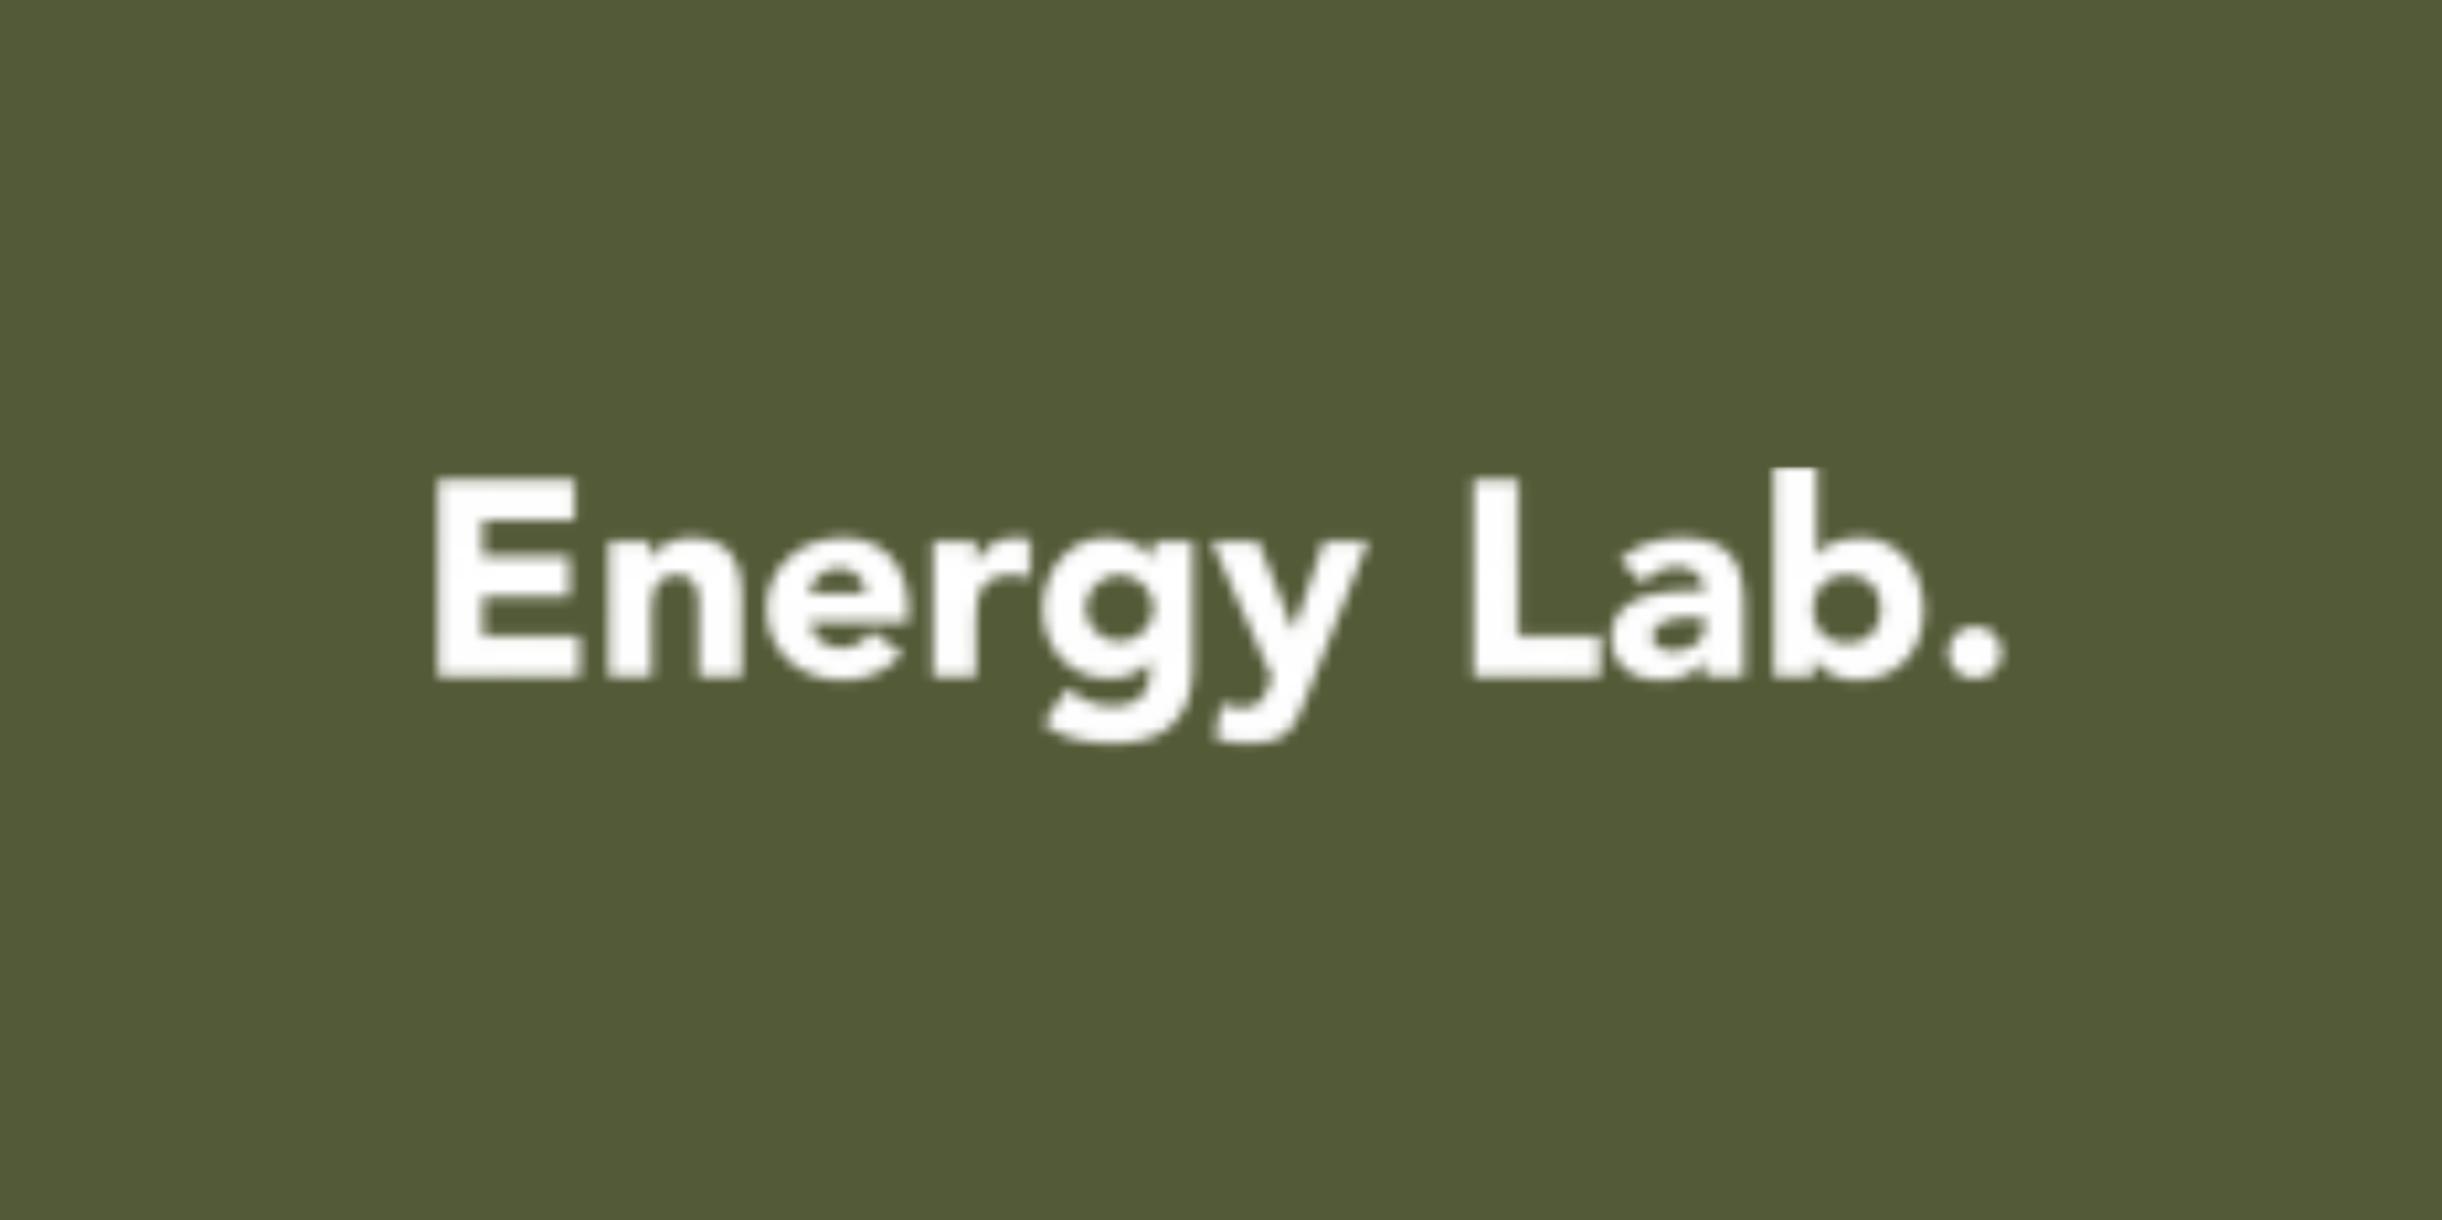 energylab-2